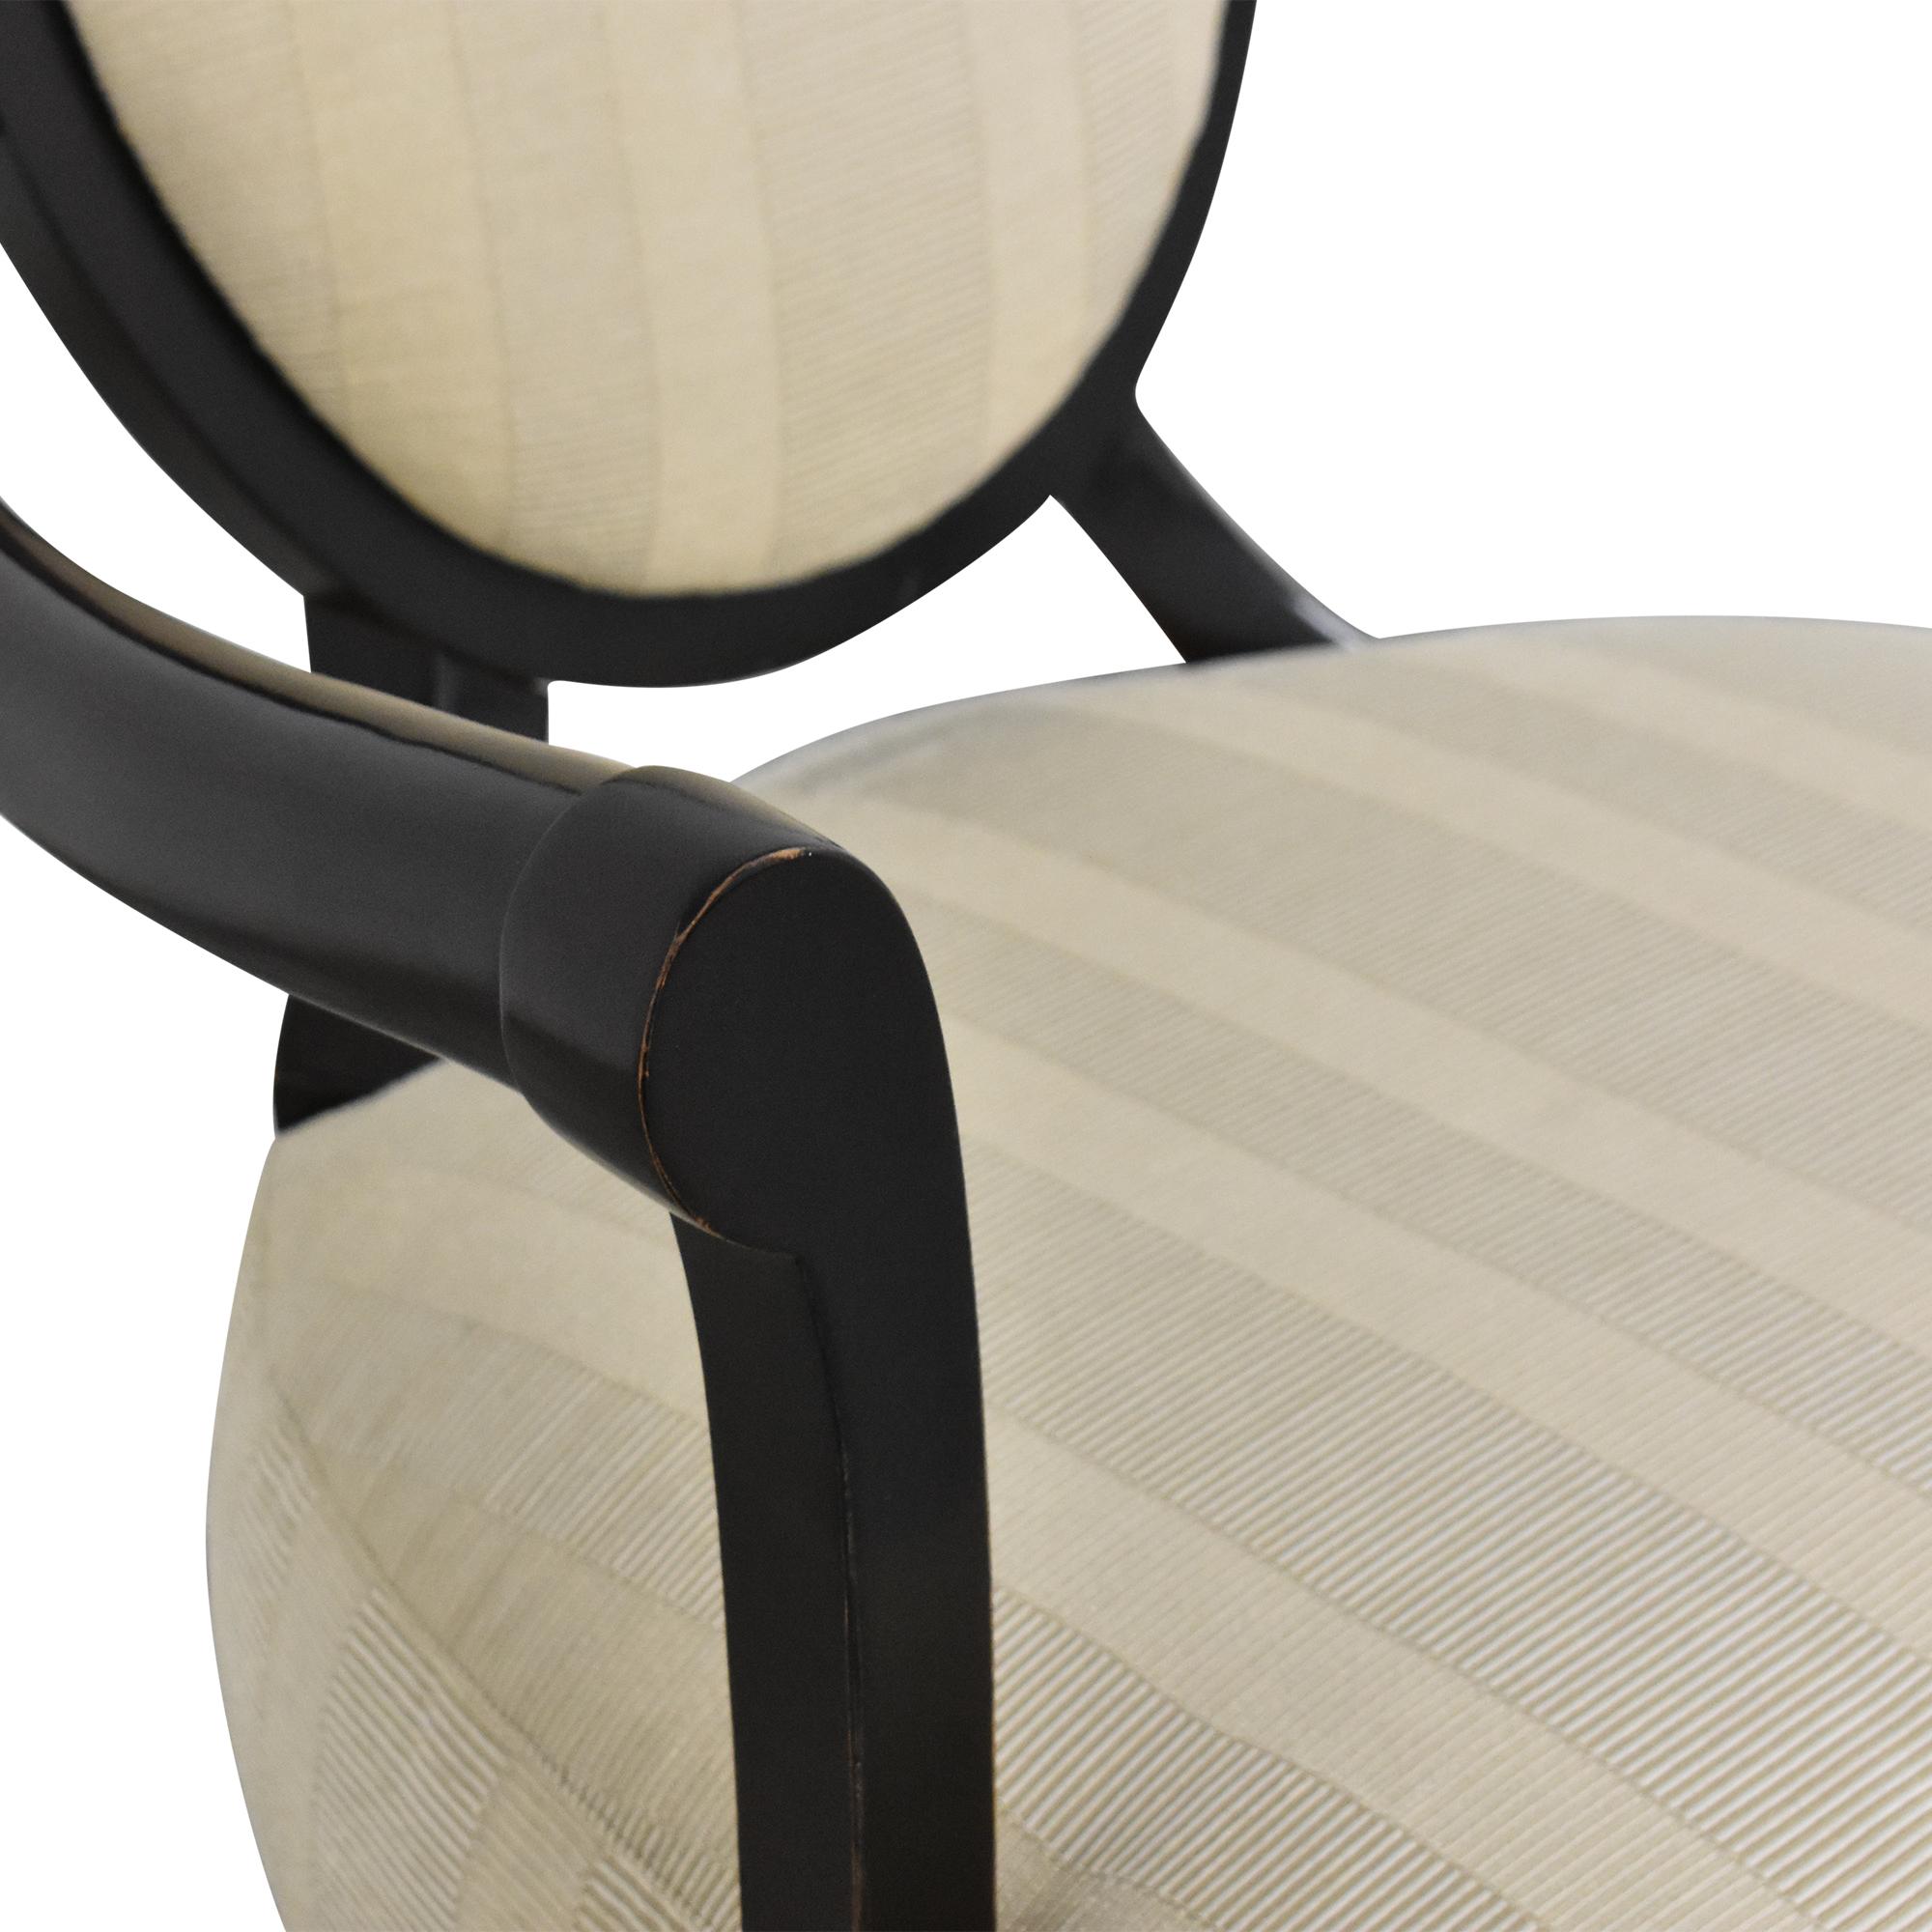 Baker Furniture Barbara Barry for Baker Furniture Oval X Back Armchair price